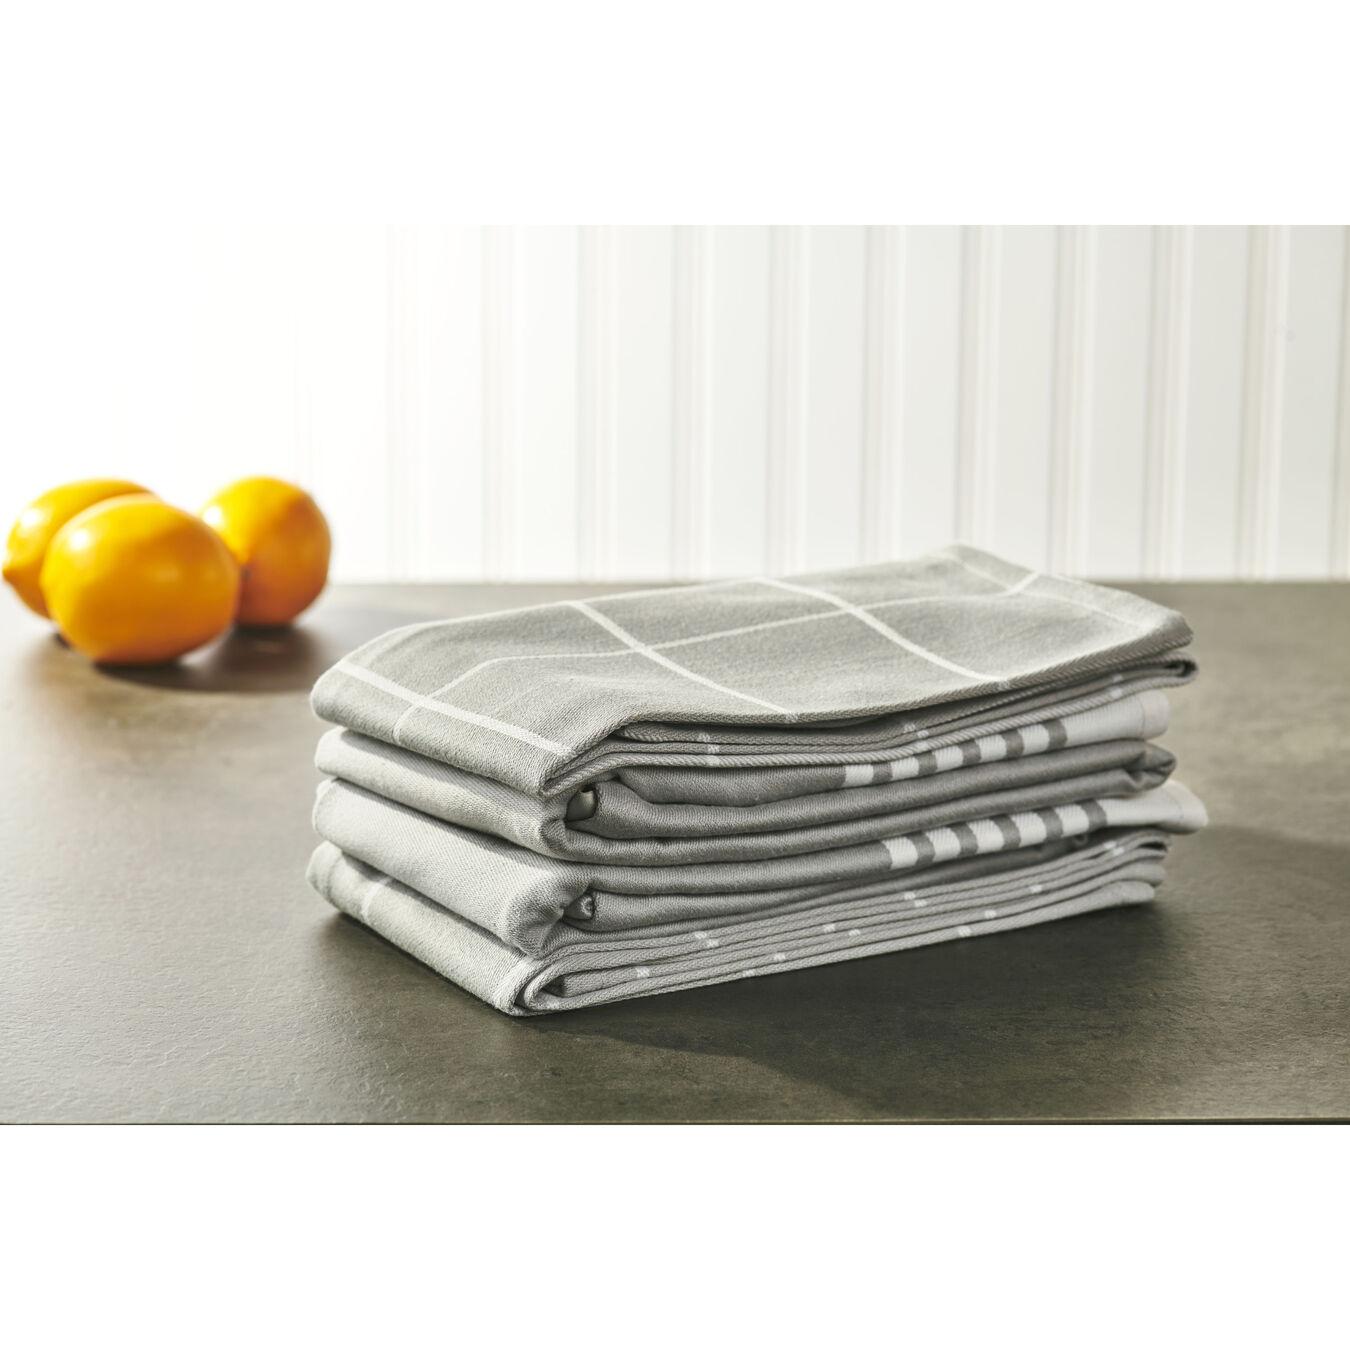 4-pc Kitchen Towel Set - Grey,,large 5